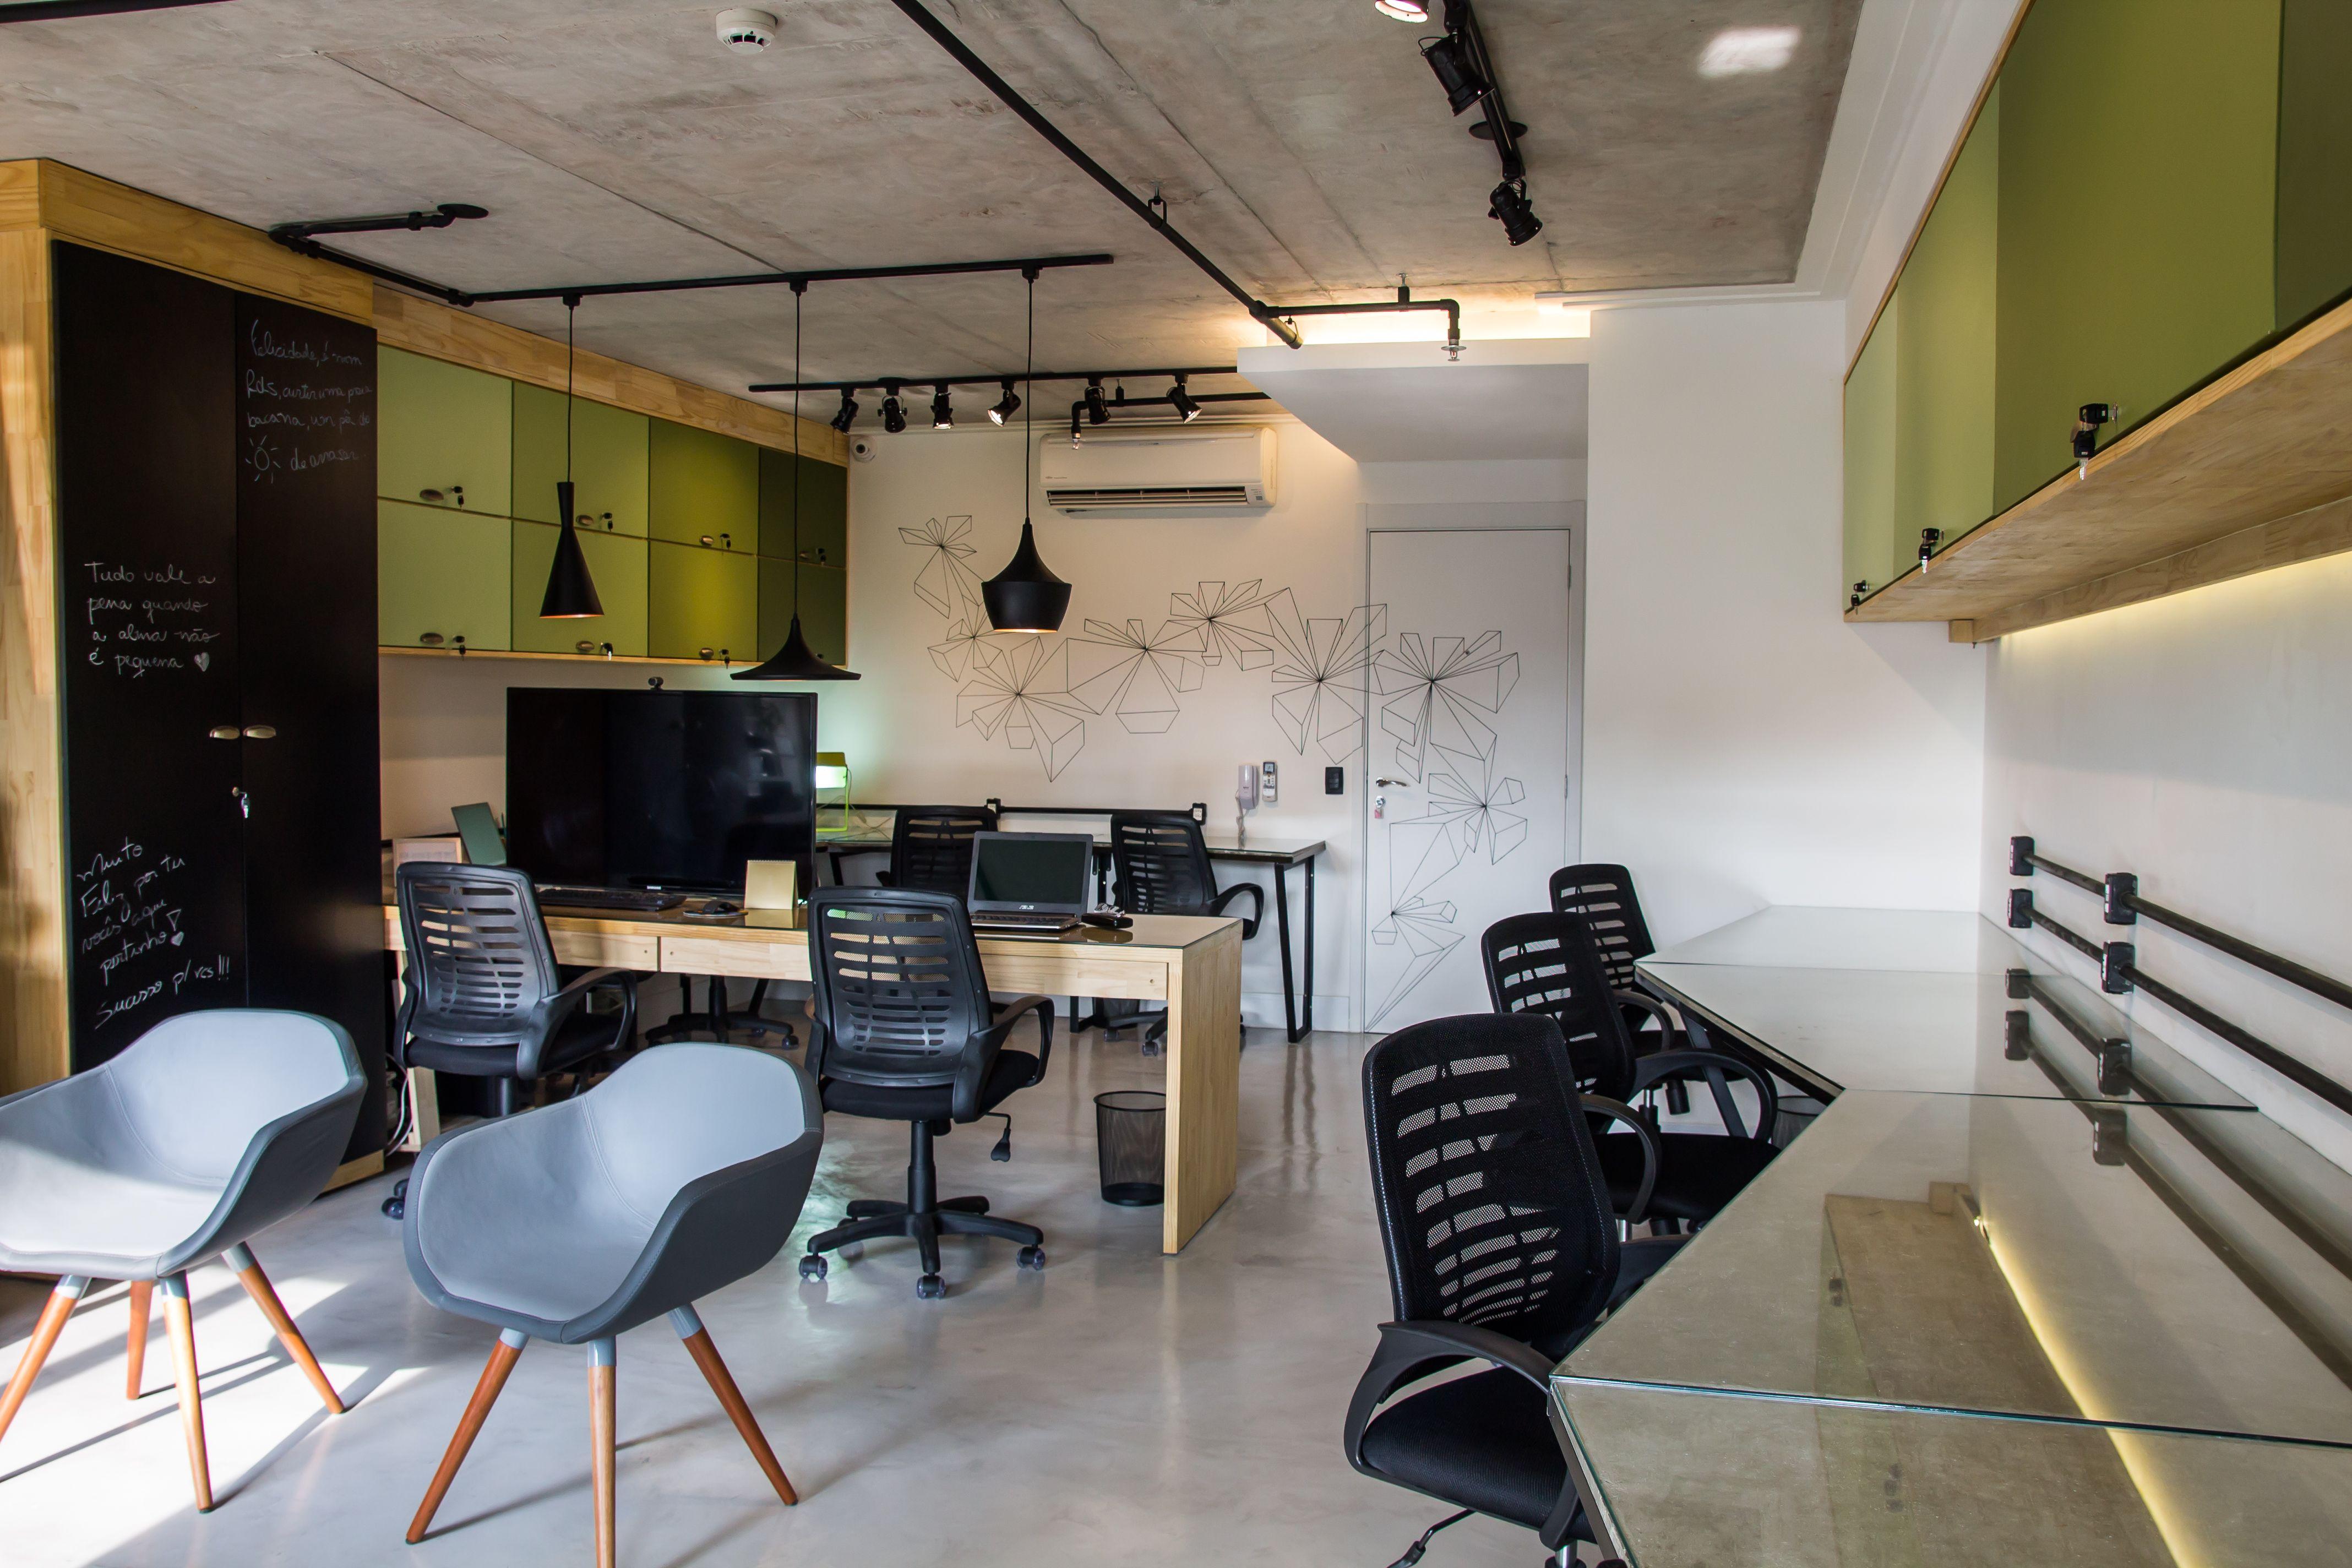 Trilhos energizados para a ilumina o e o teto no concreto for Stylische bilder wohnzimmer